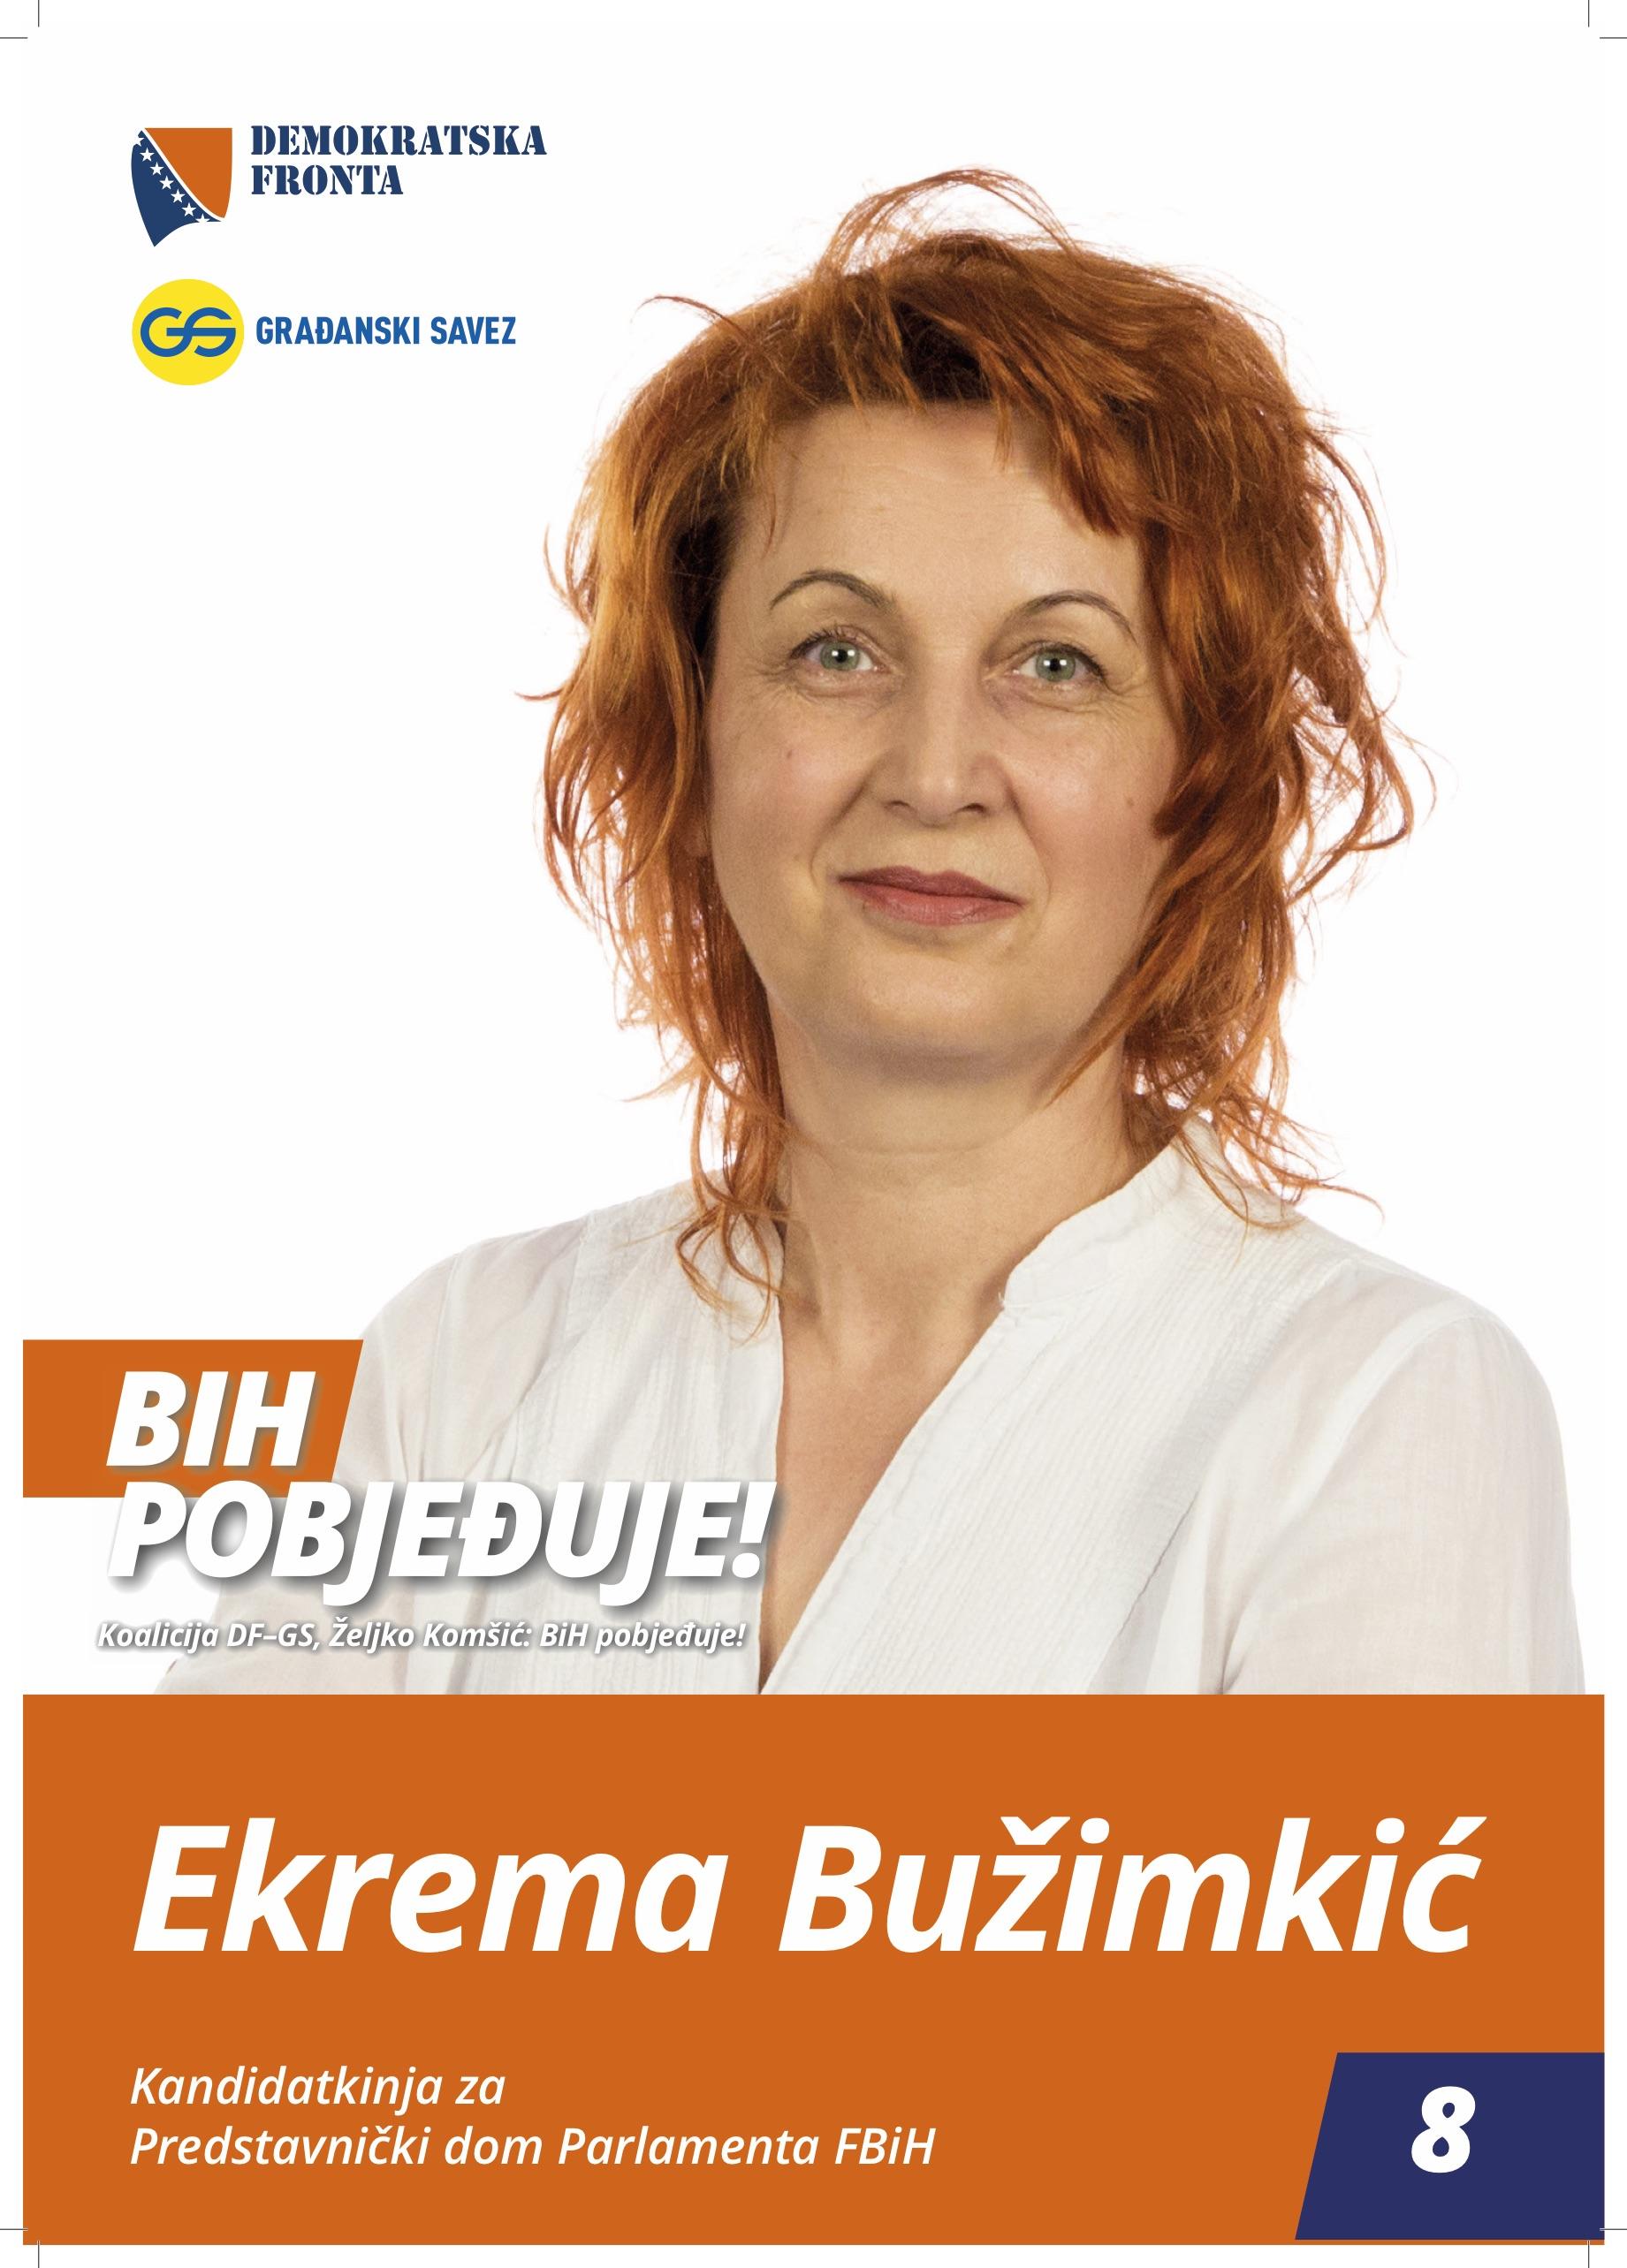 Ekrema Bužimkić, medicinska sestra